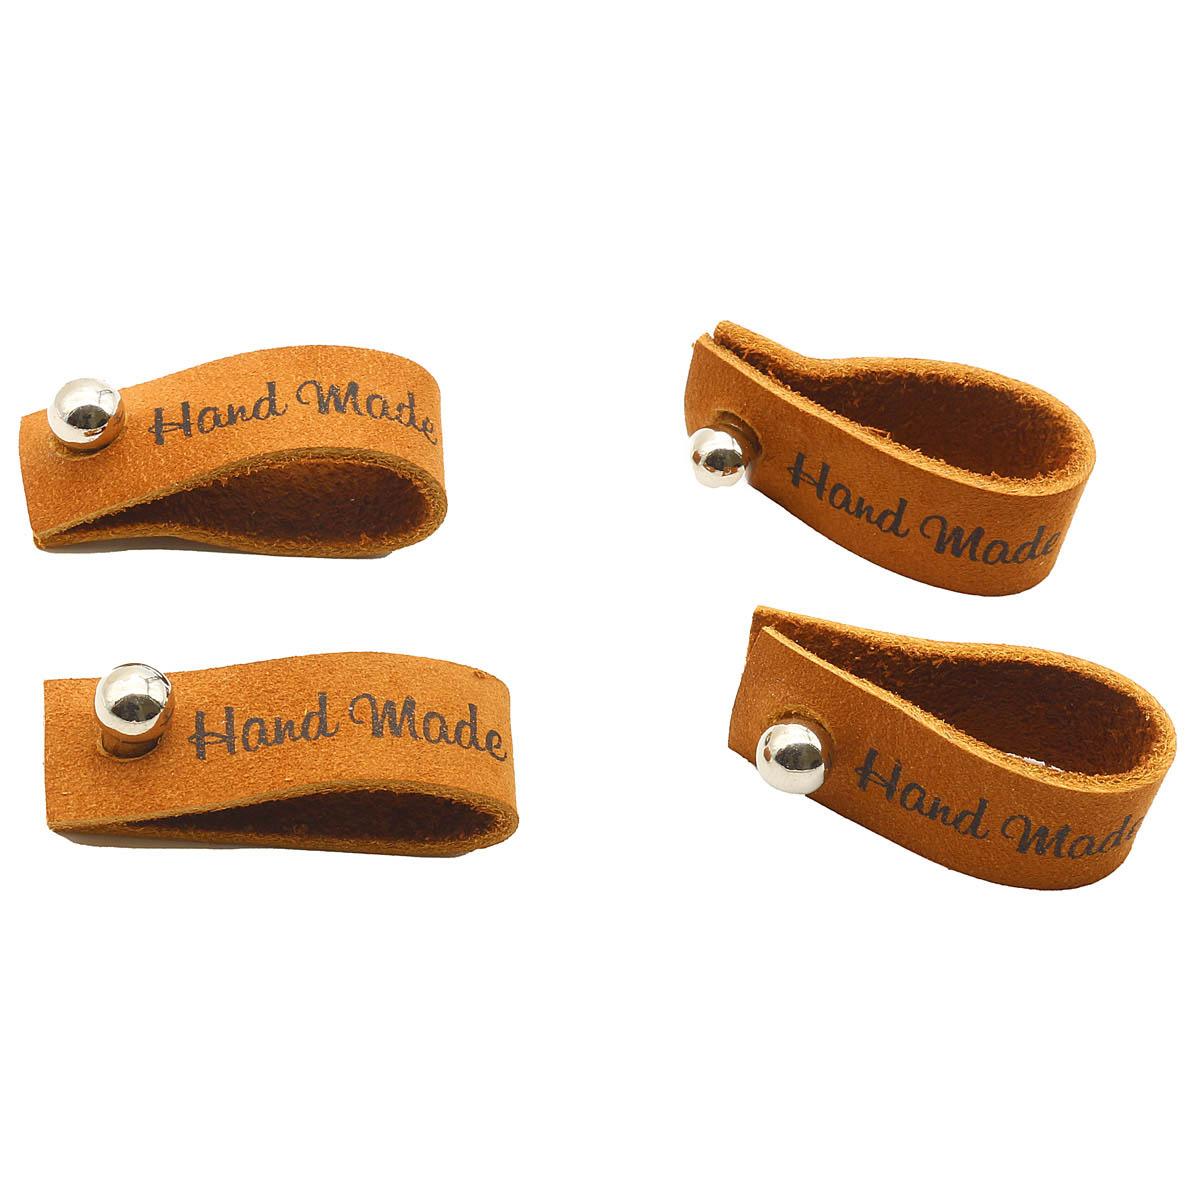 Набор кожаных бирок с кнопкой 'Hand Made' 1,3*7см, цв. коричн., уп.8шт